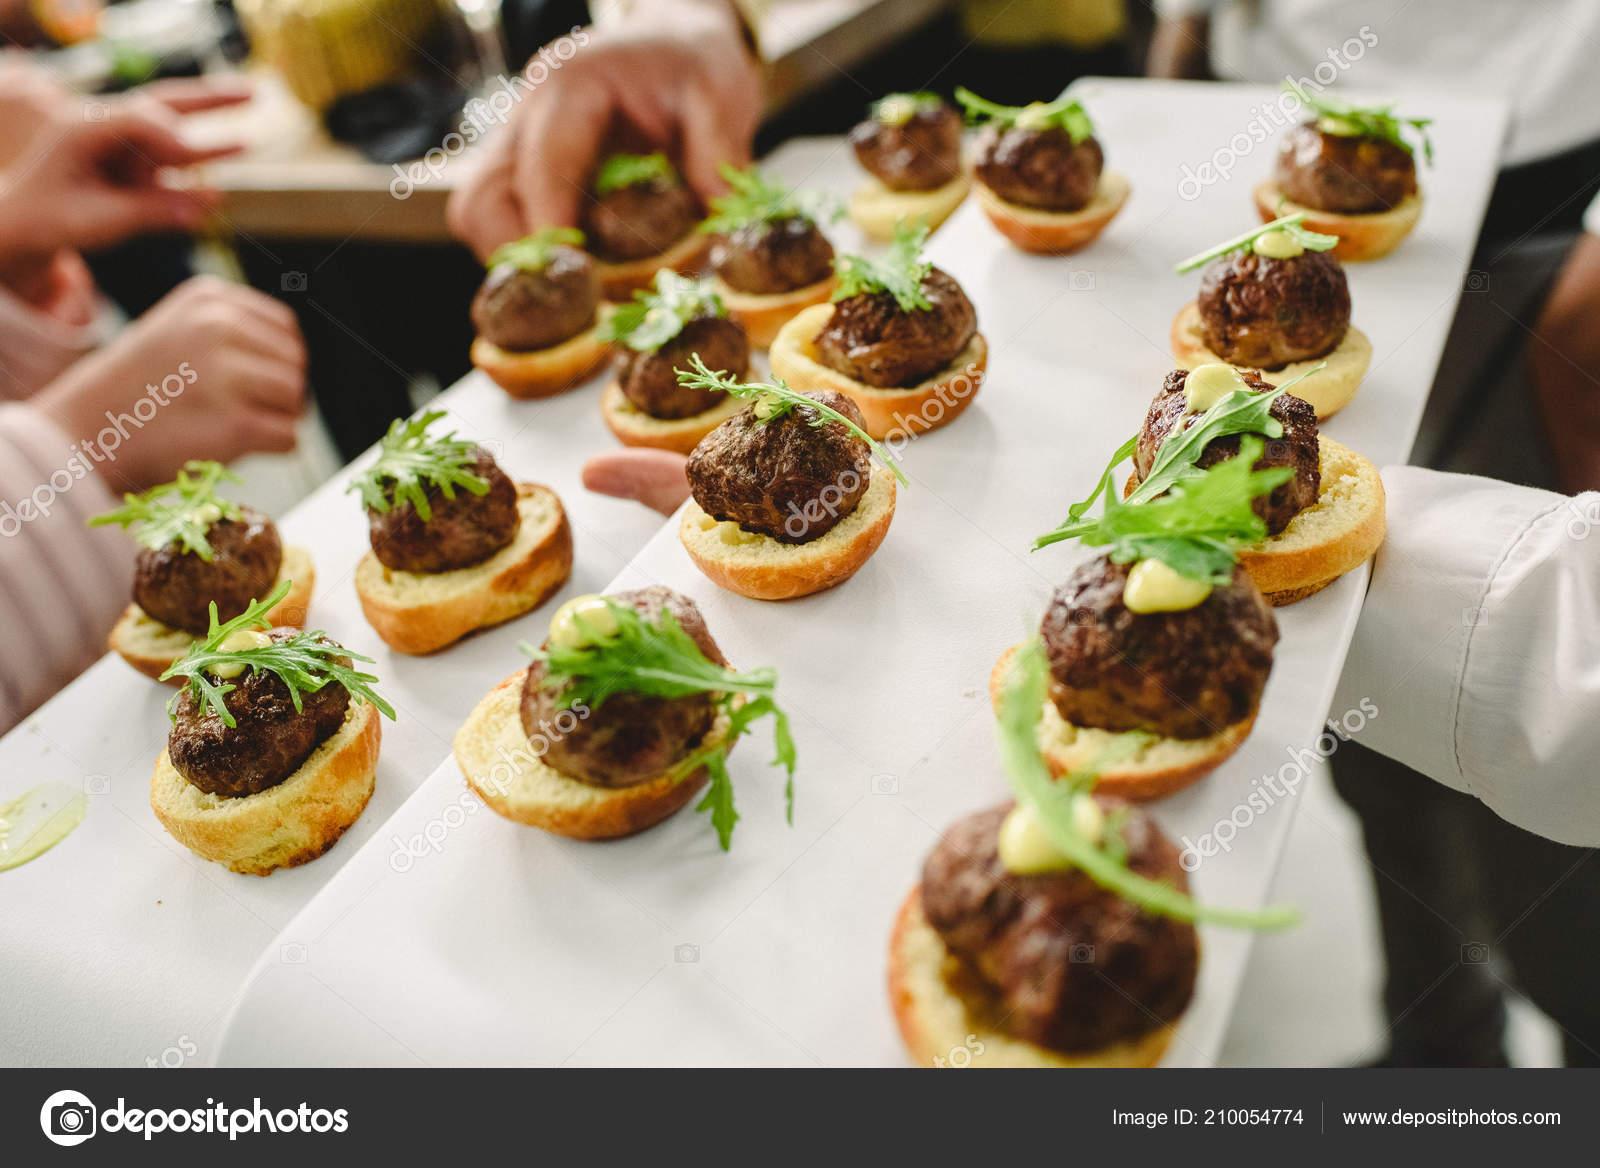 Wedding Food Ideas Appetizers Stock Photo Image By C Joaquincorbalan 210054774